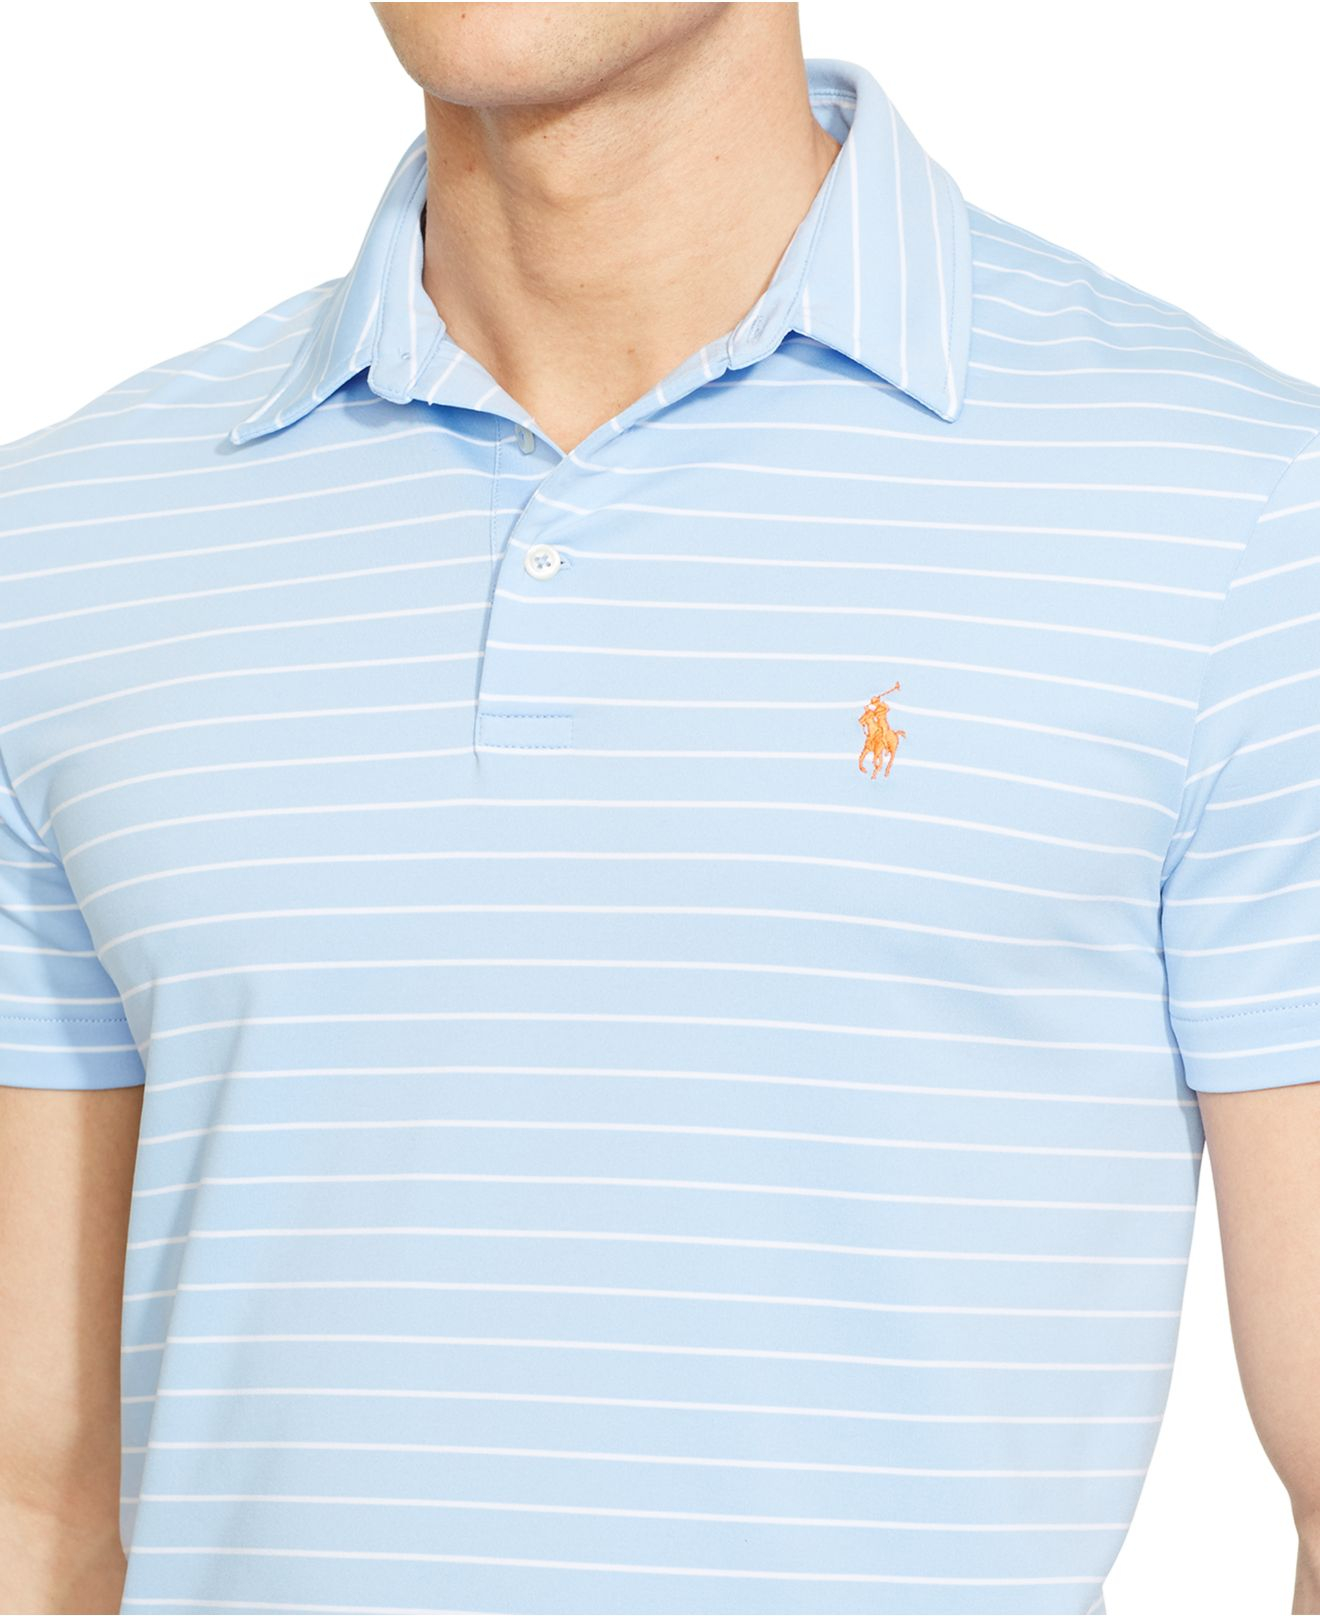 Polo Ralph Lauren Striped Performance Polo Shirt In Blue